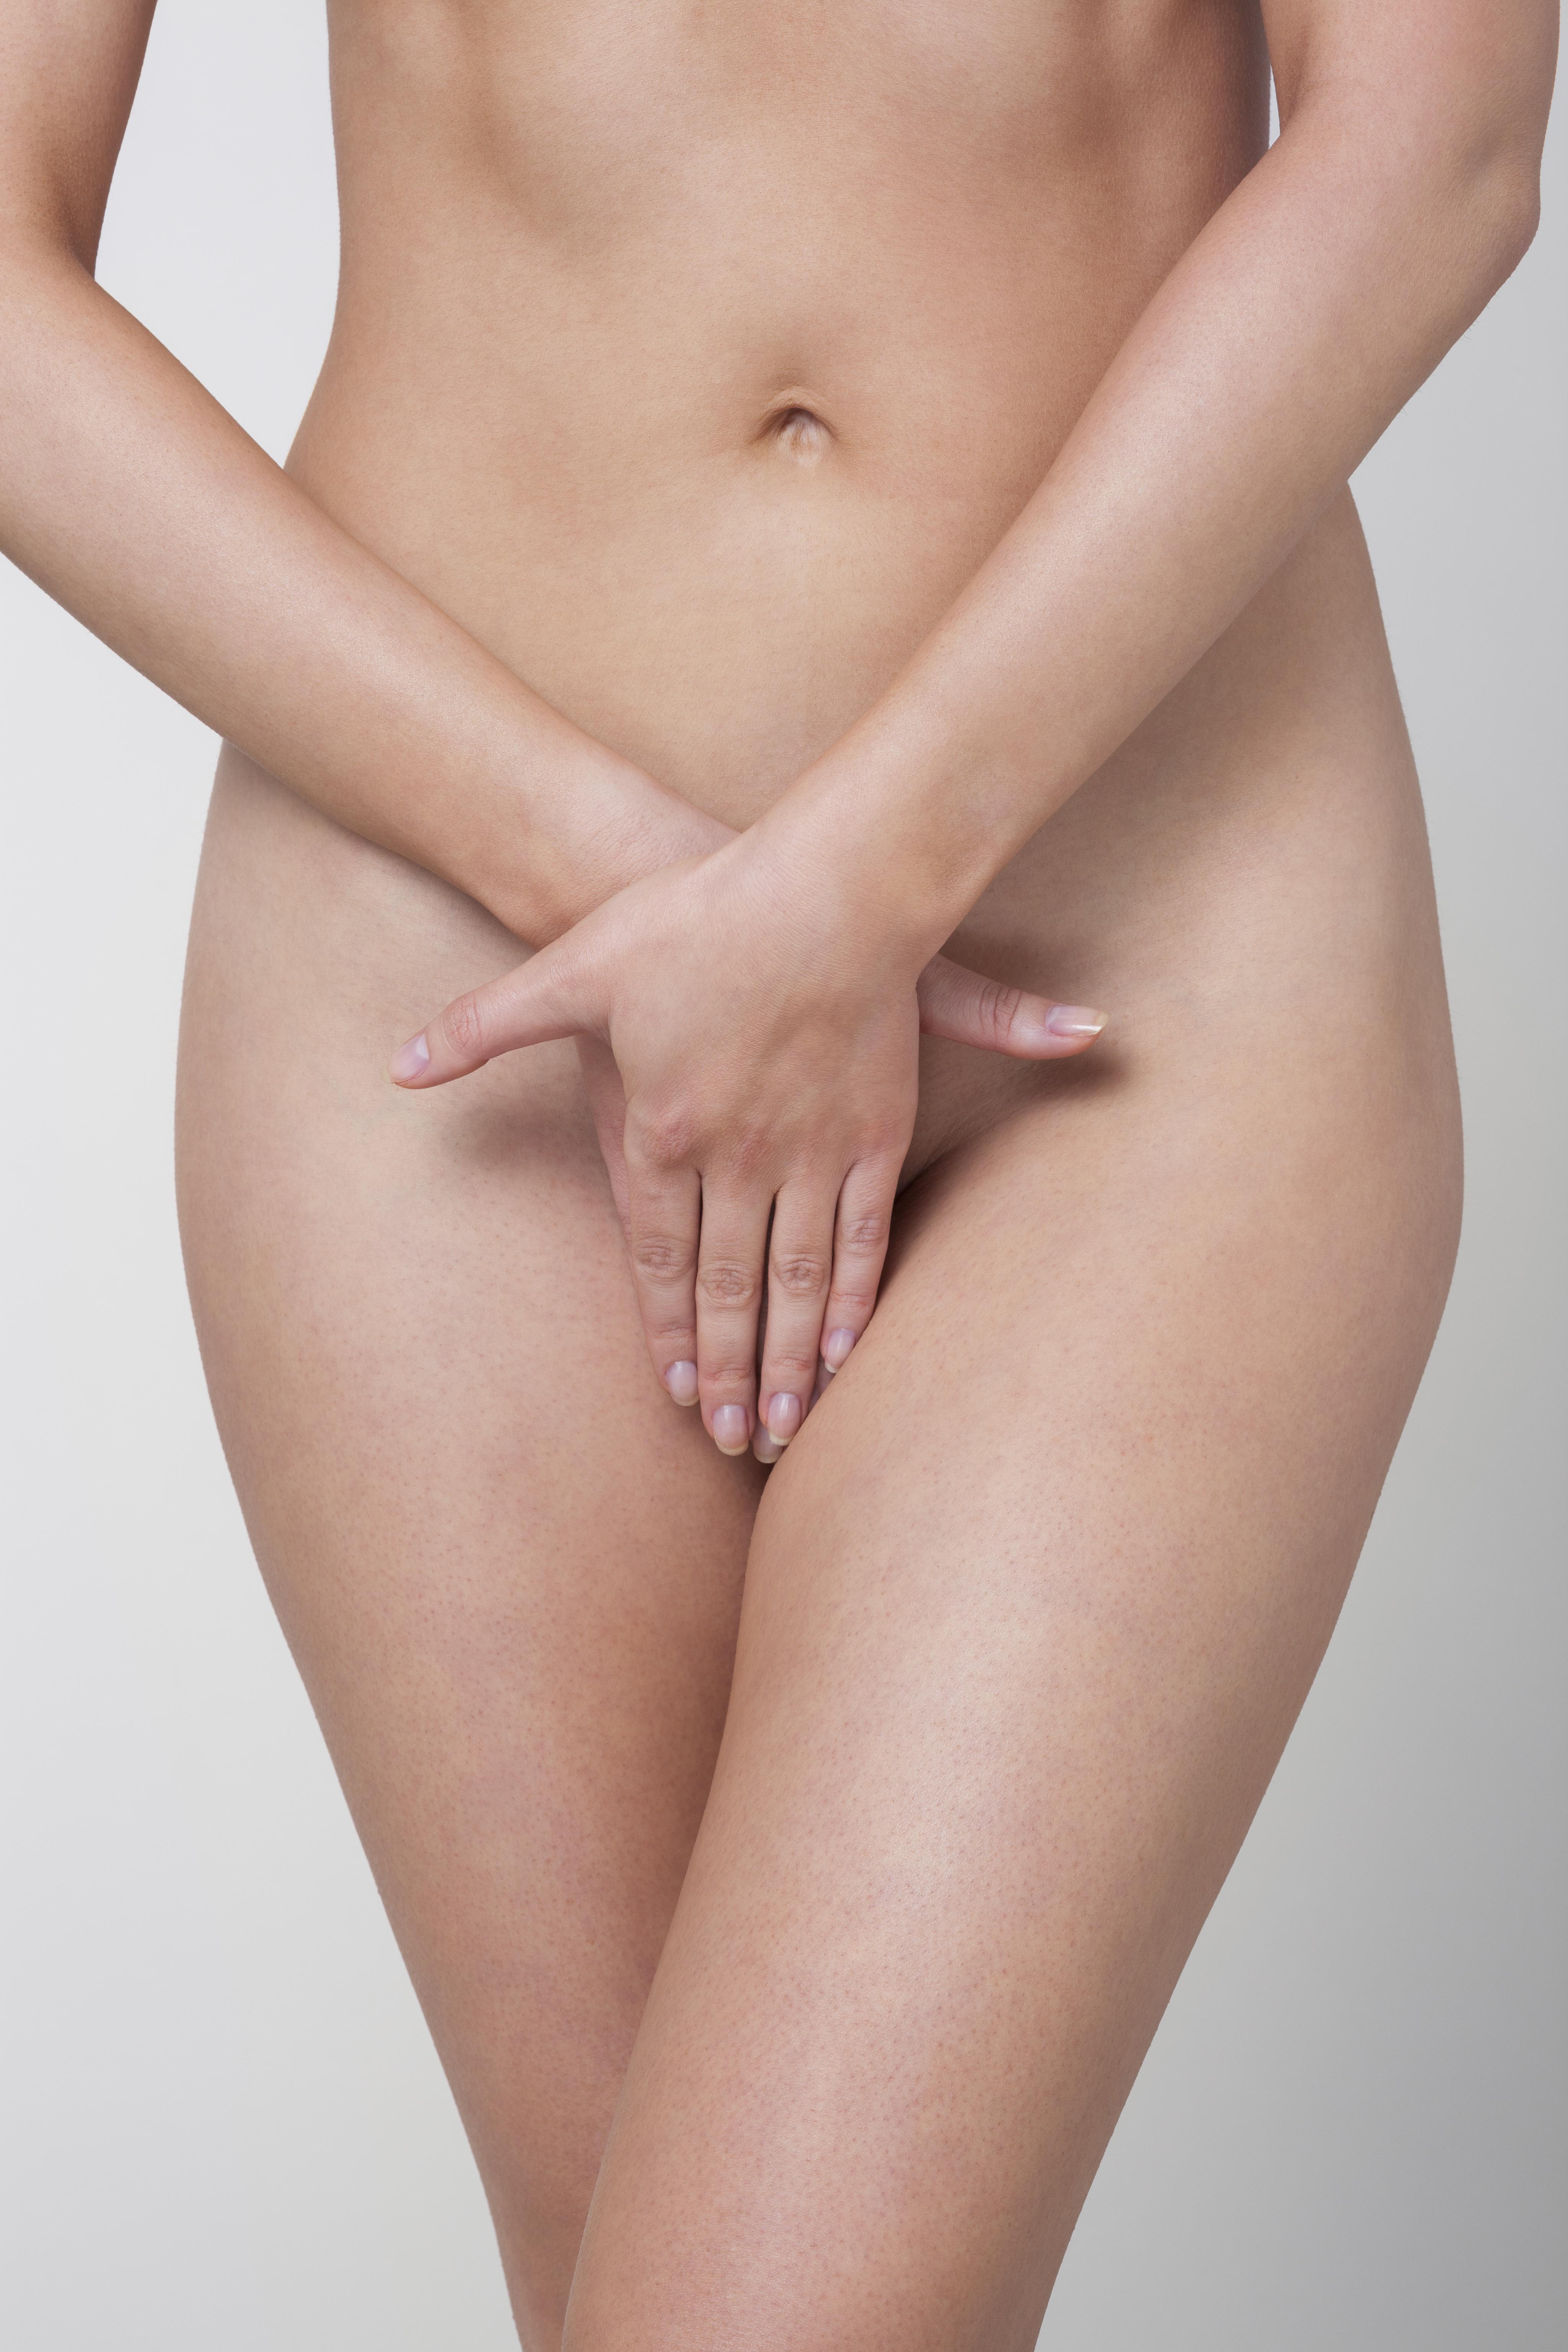 Shapes of hot vagina pcs